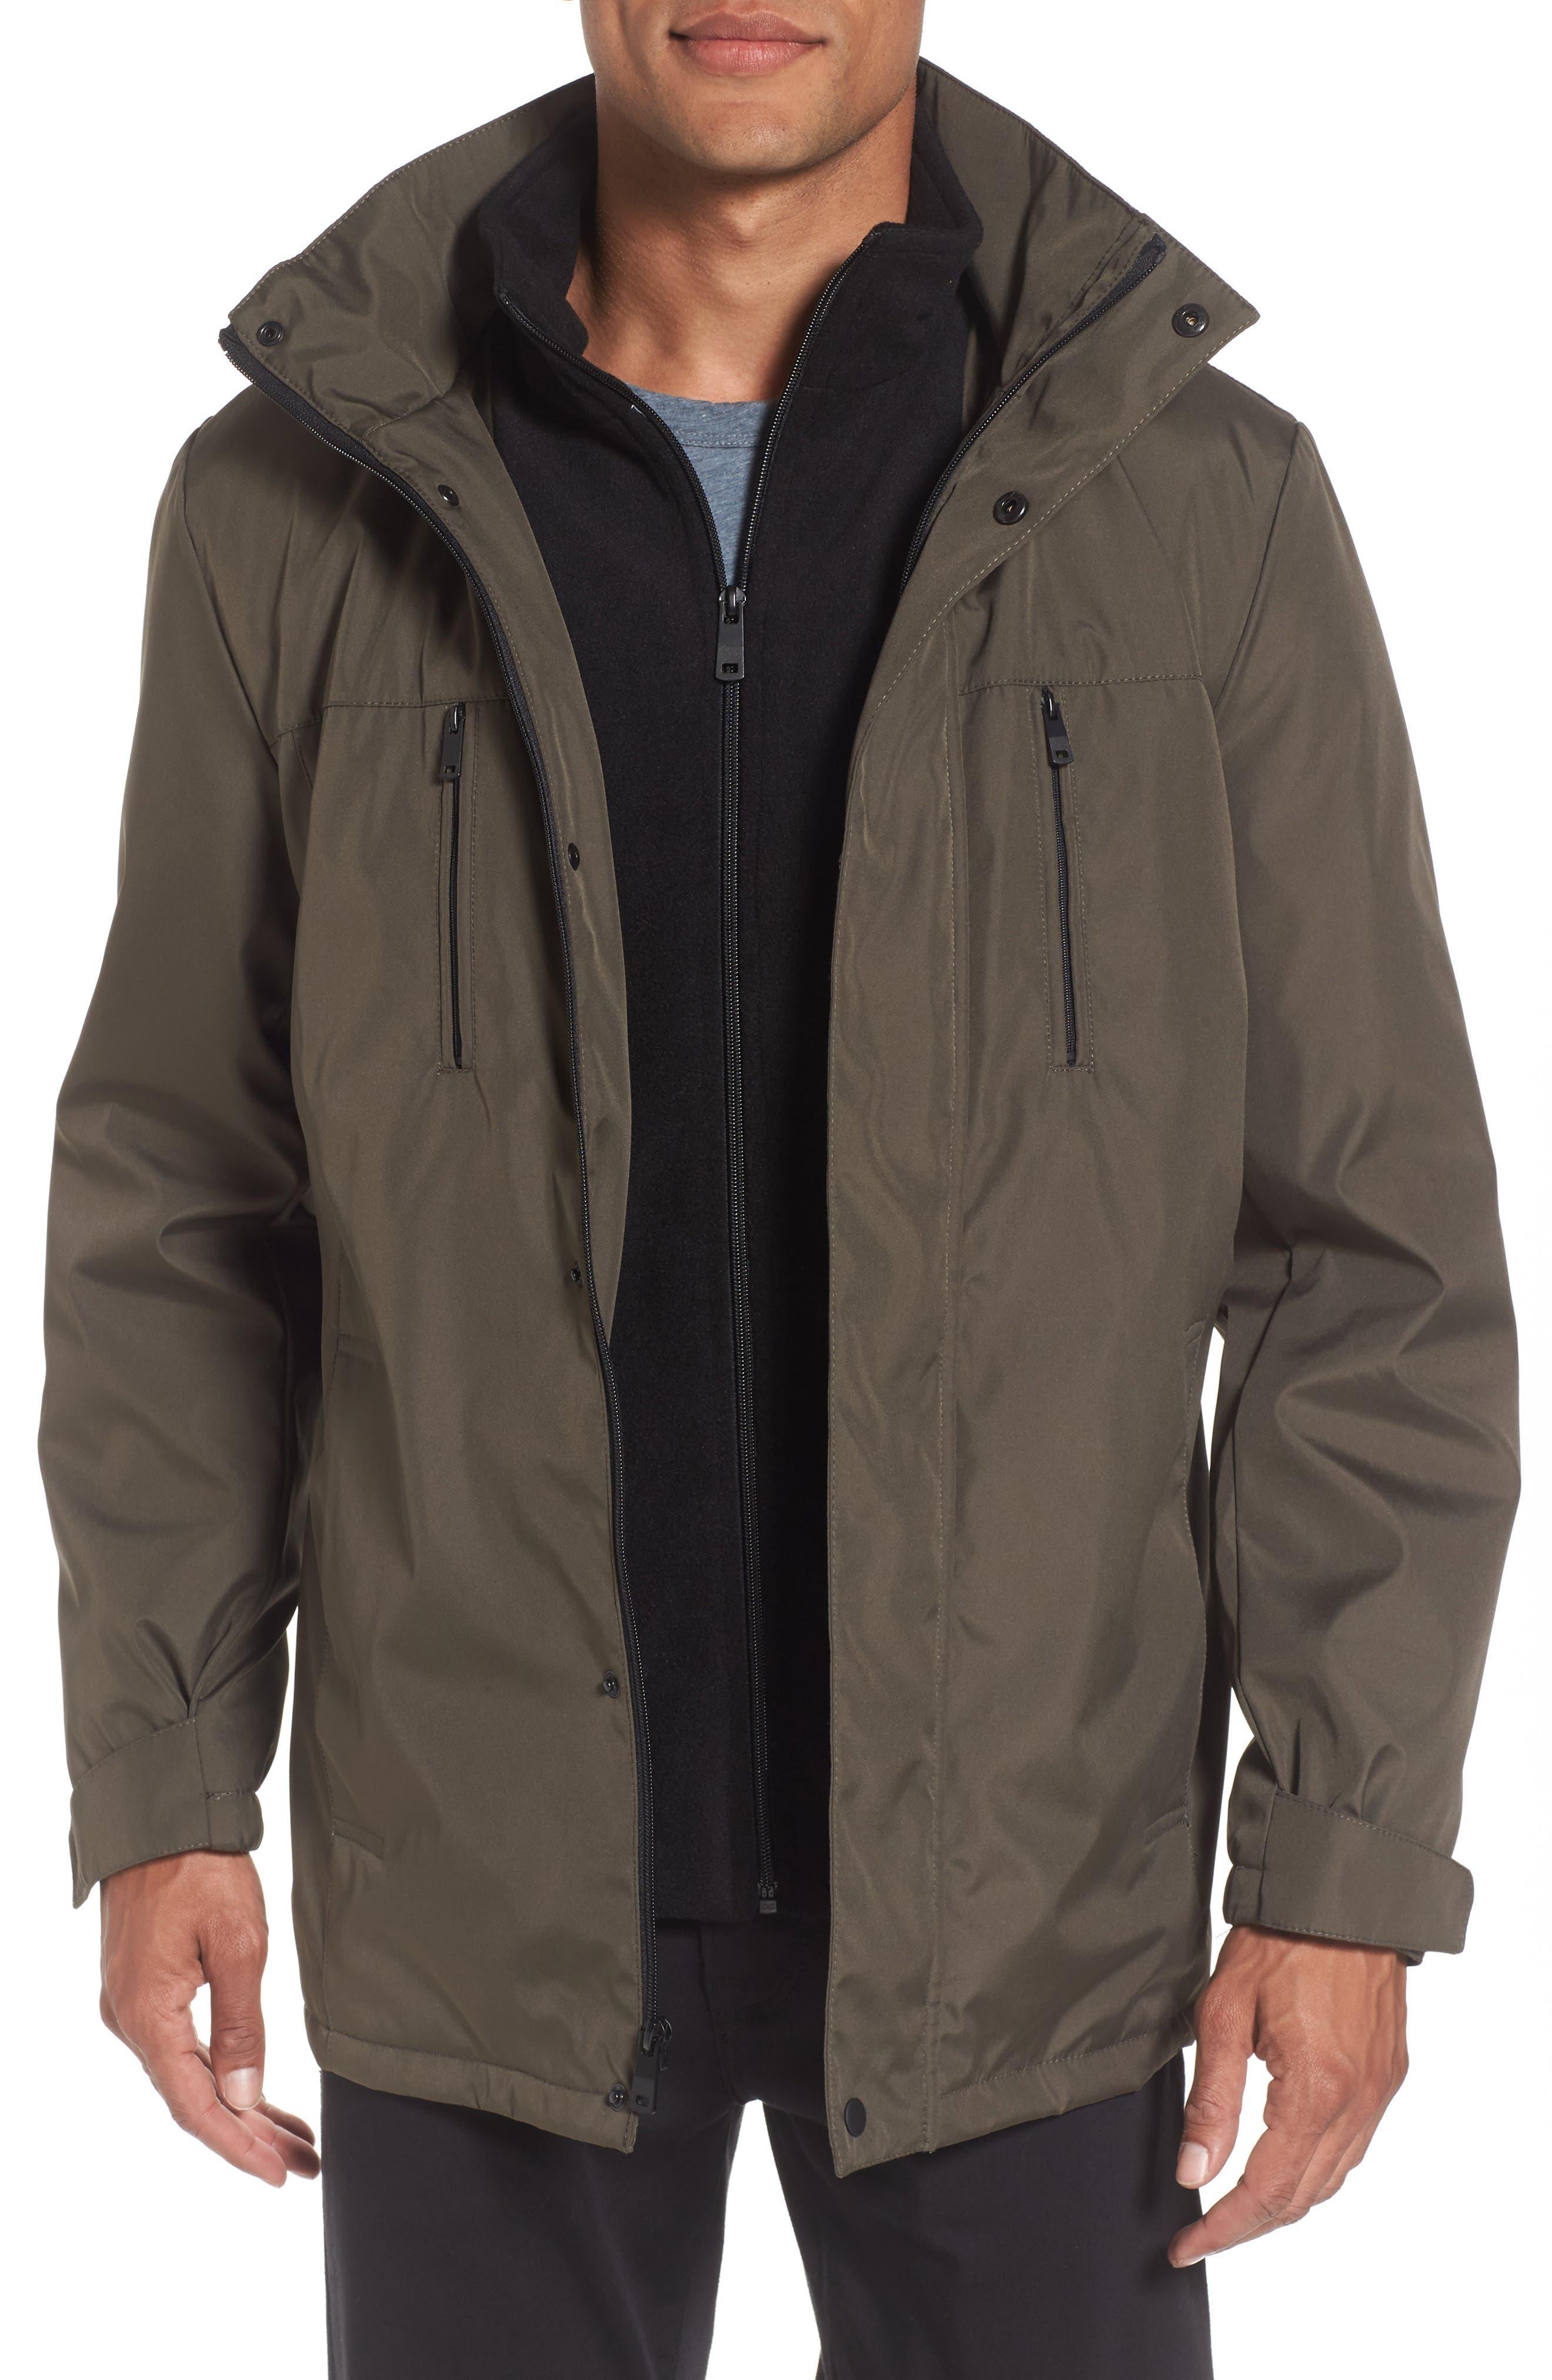 Hooded Jacket with Inset Fleece Bib,                             Main thumbnail 3, color,